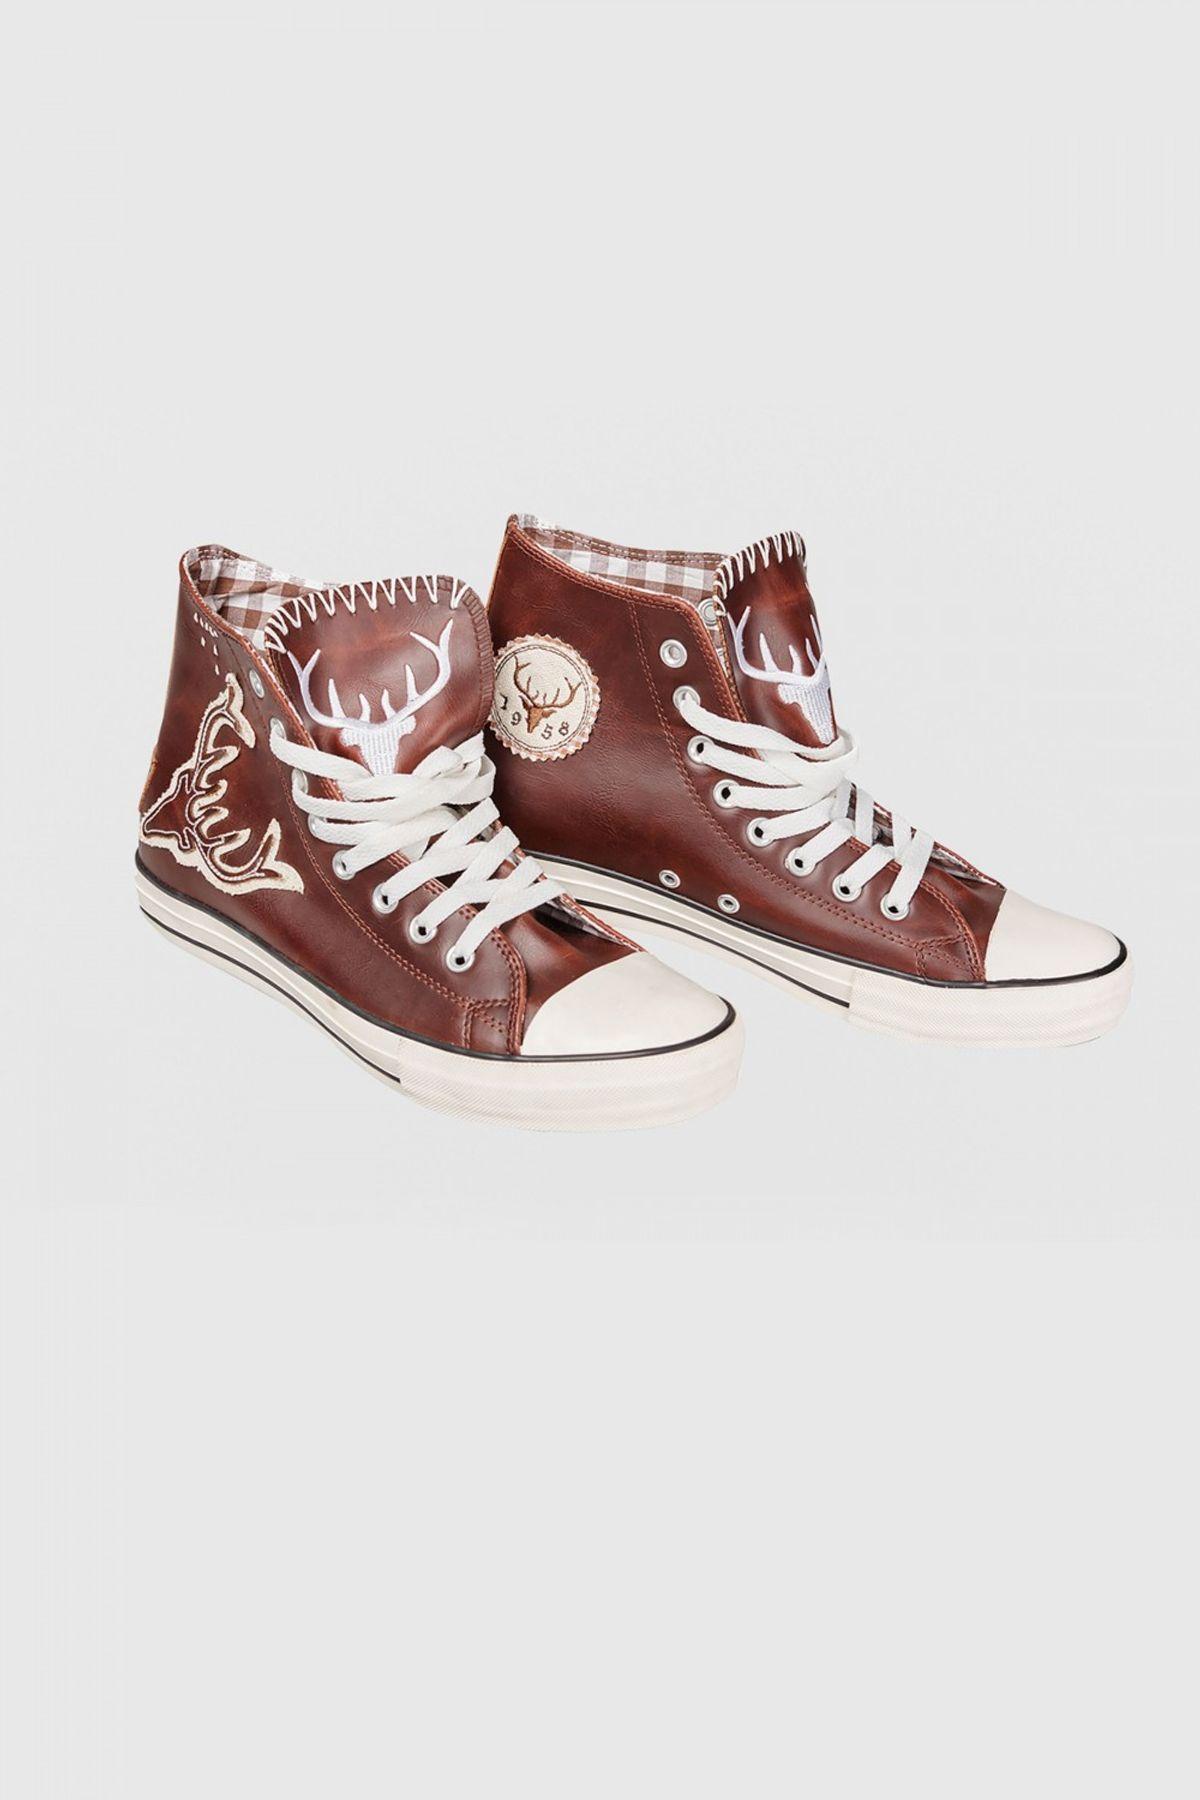 Krüger - Herren Trachtenschuhe -Sneaker- im modernen Trachten-Look in Braun, Wildfang (Artikelnummer: 9008-7) – Bild 2